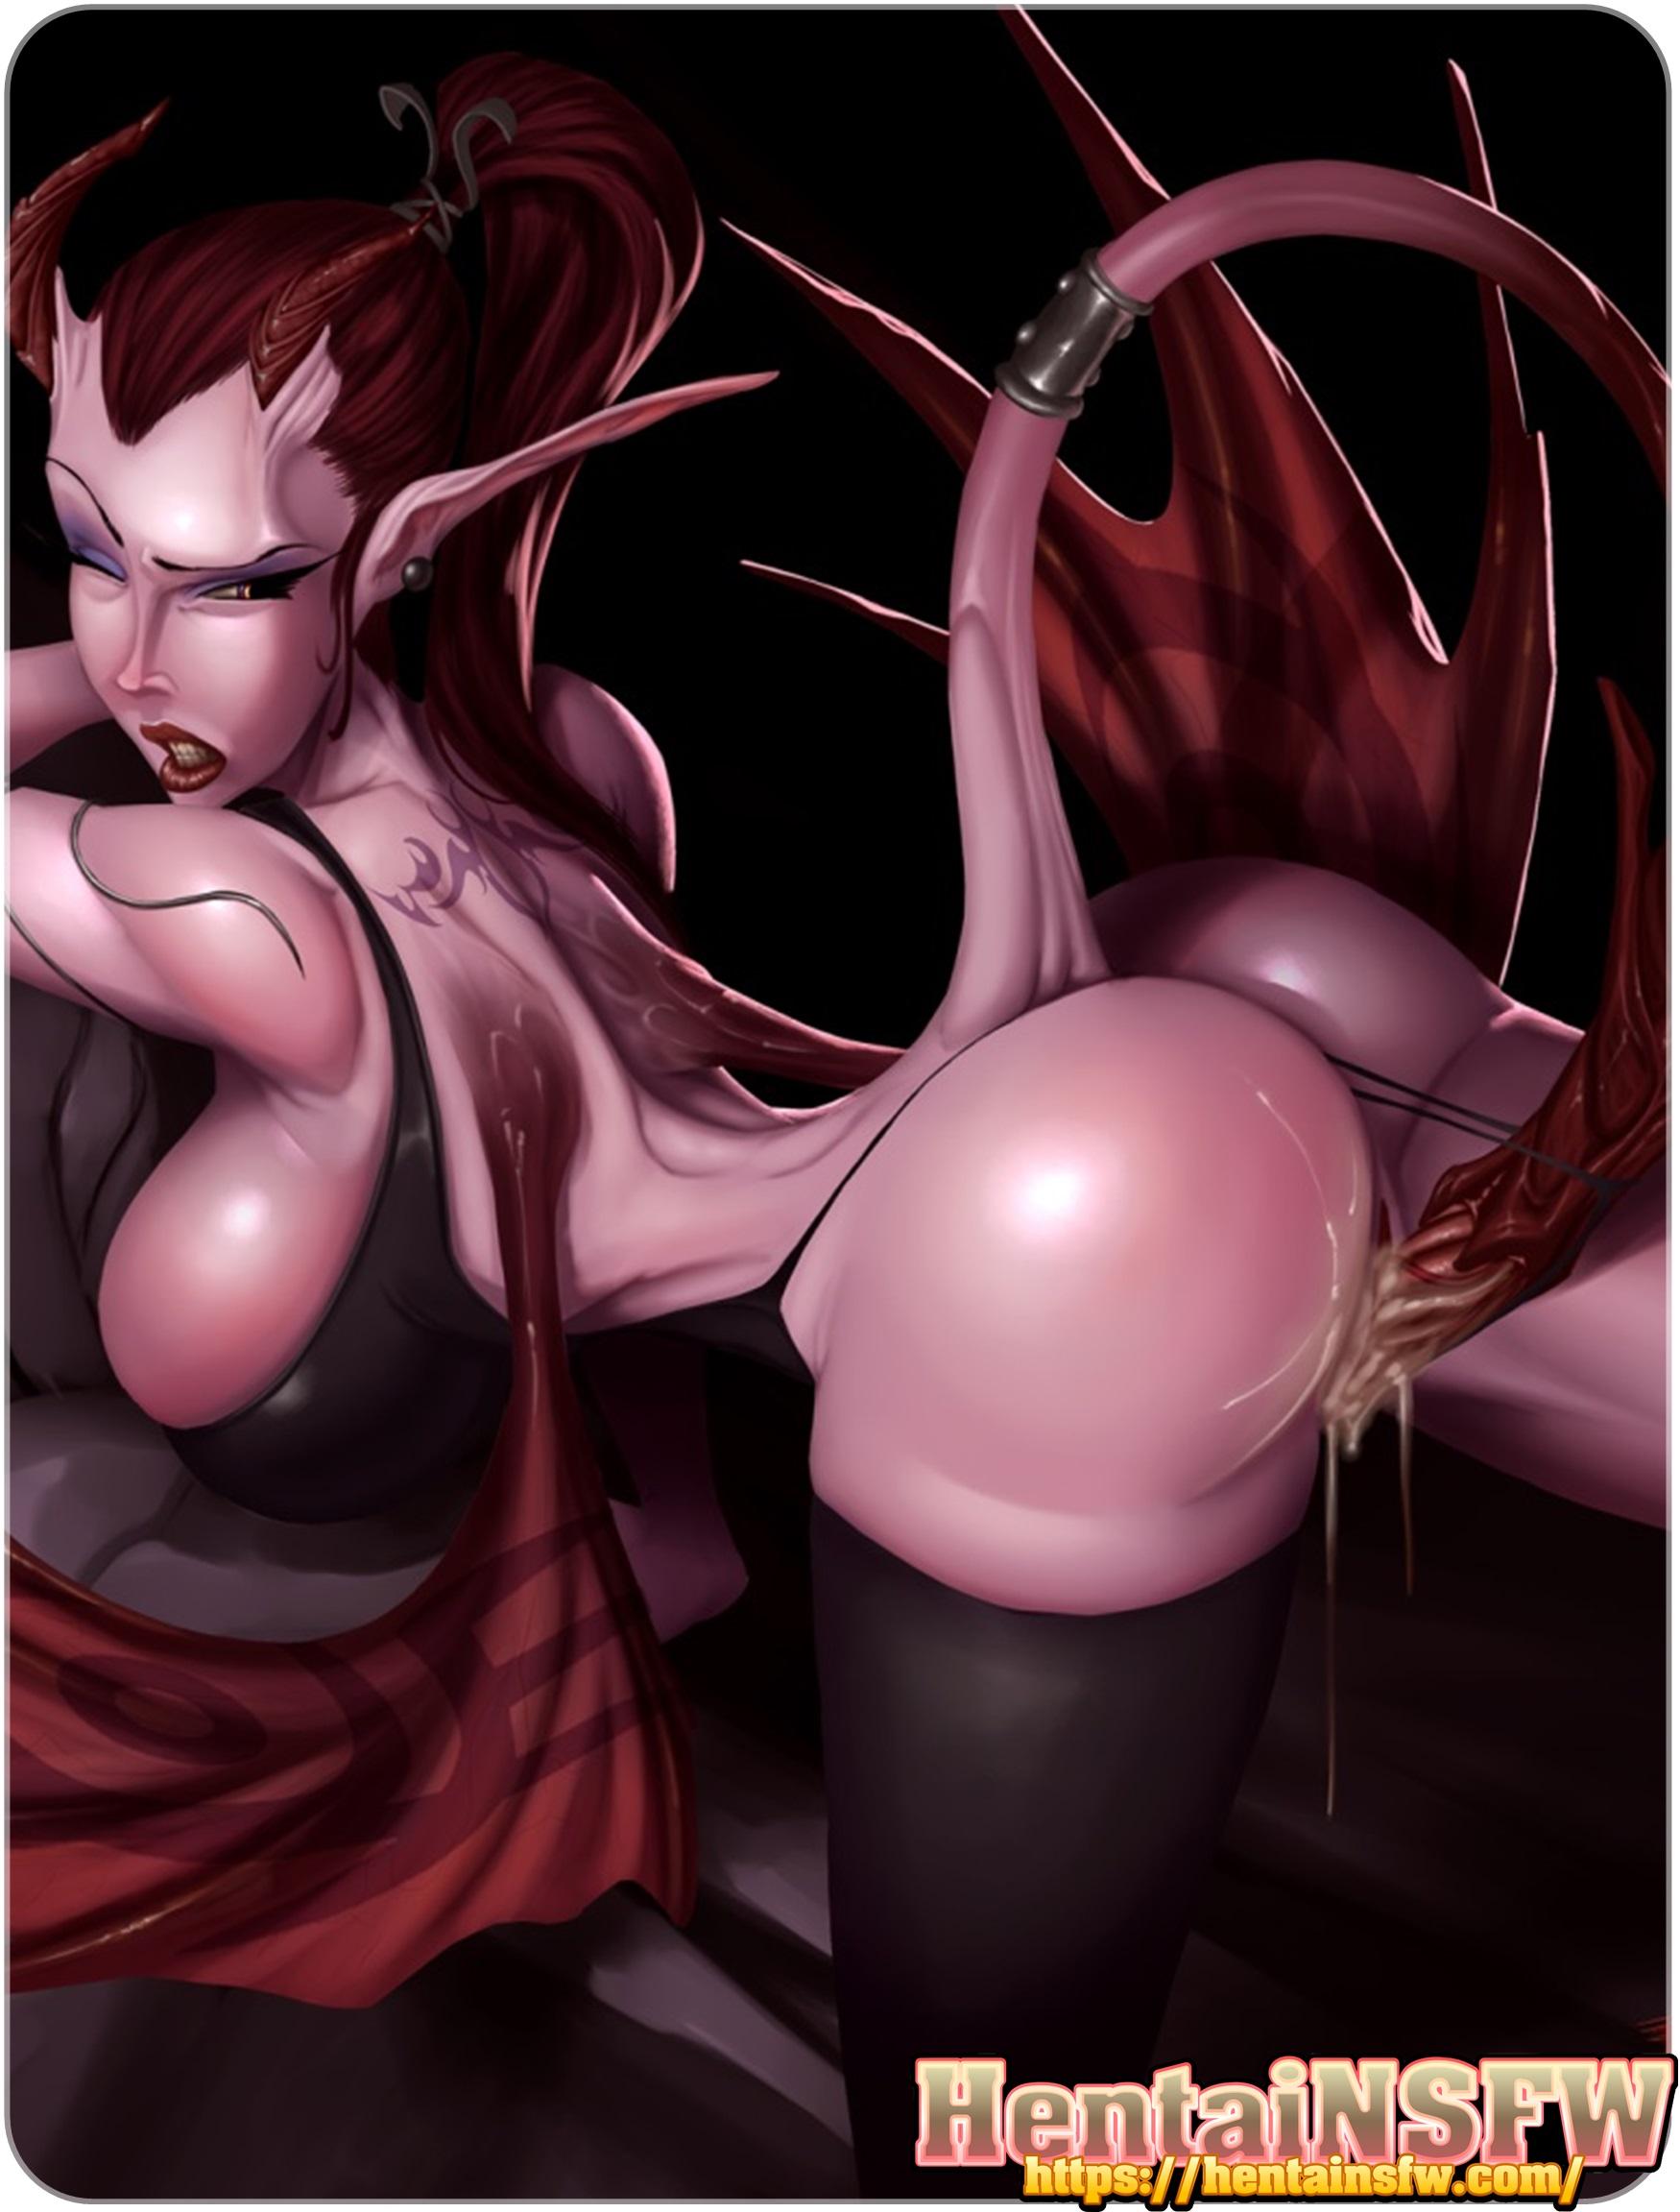 Alien Hentai Anime sexy oppai hentai babe getting penetrateda demonic alien